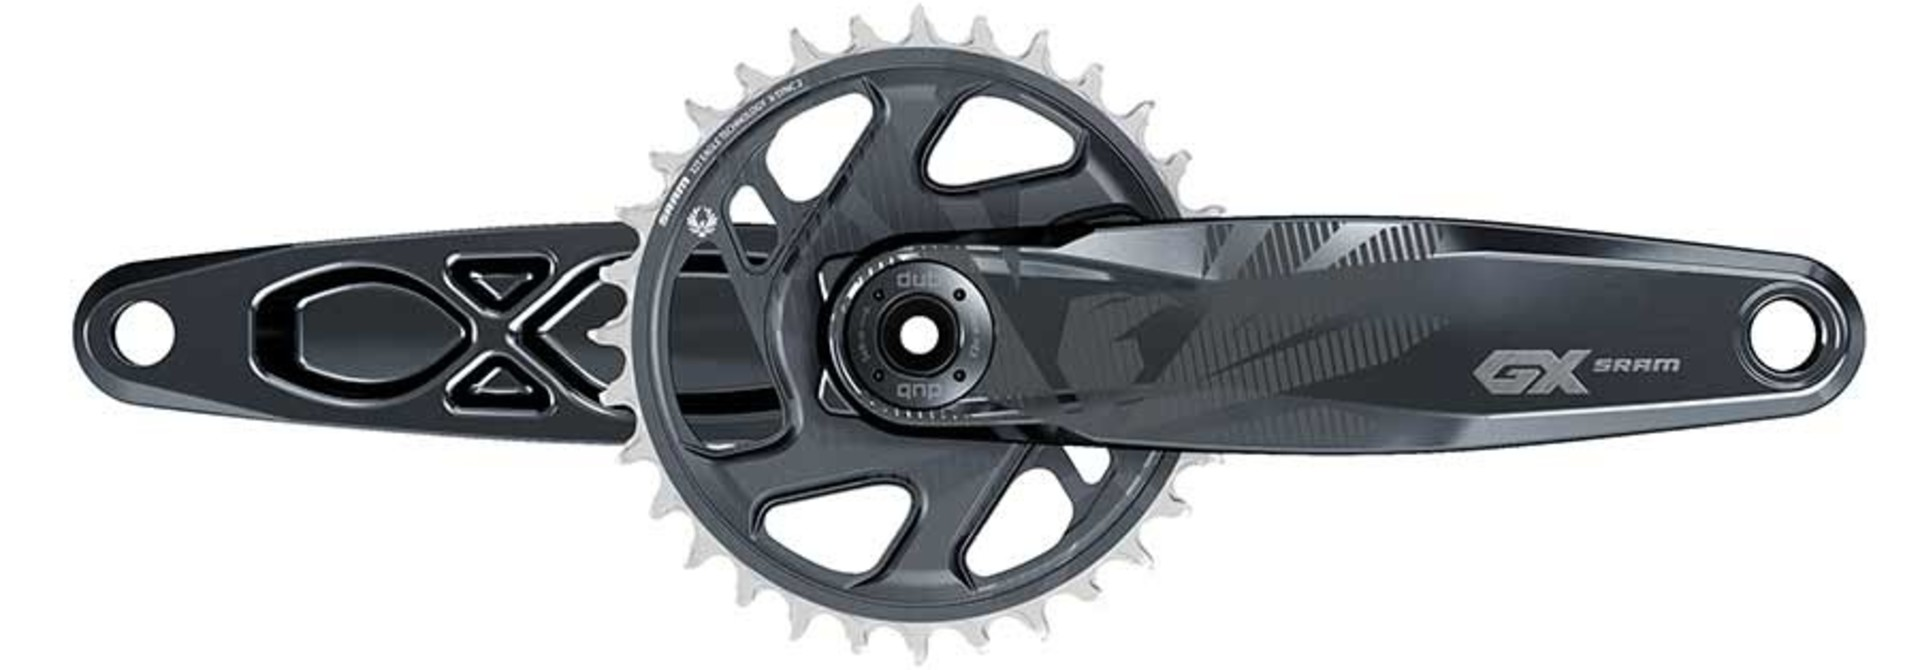 SRAM, GX Eagle DUB C1, Crankset, Speed: 11/12, Spindle: 28.99mm, BCD: Direct Mount, 32, DUB, 170mm, Black, SuperBoost+